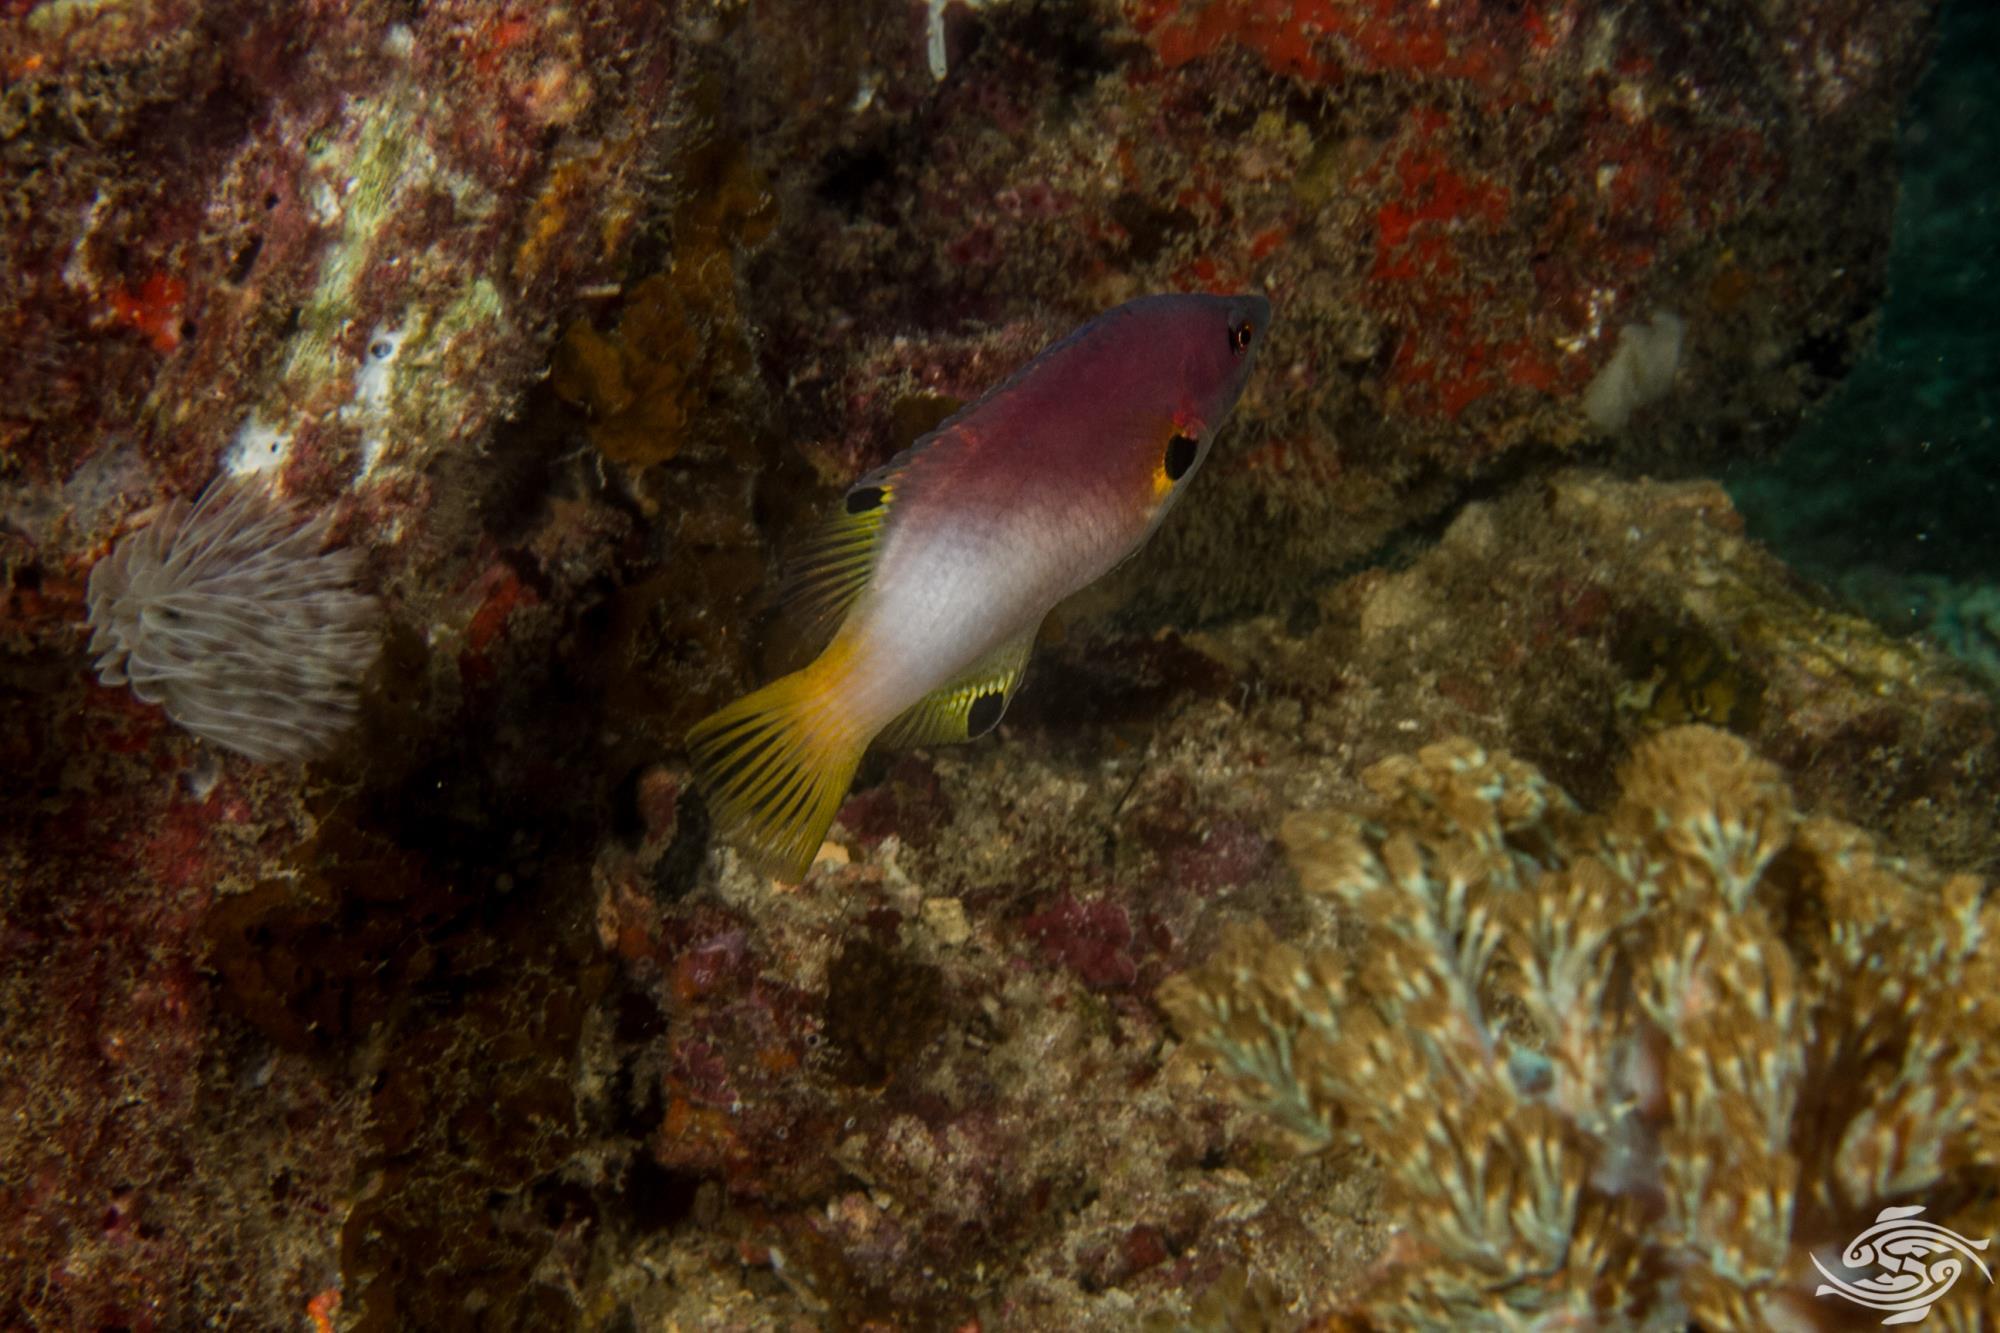 axilspot hogfish, Bodianus axillaris